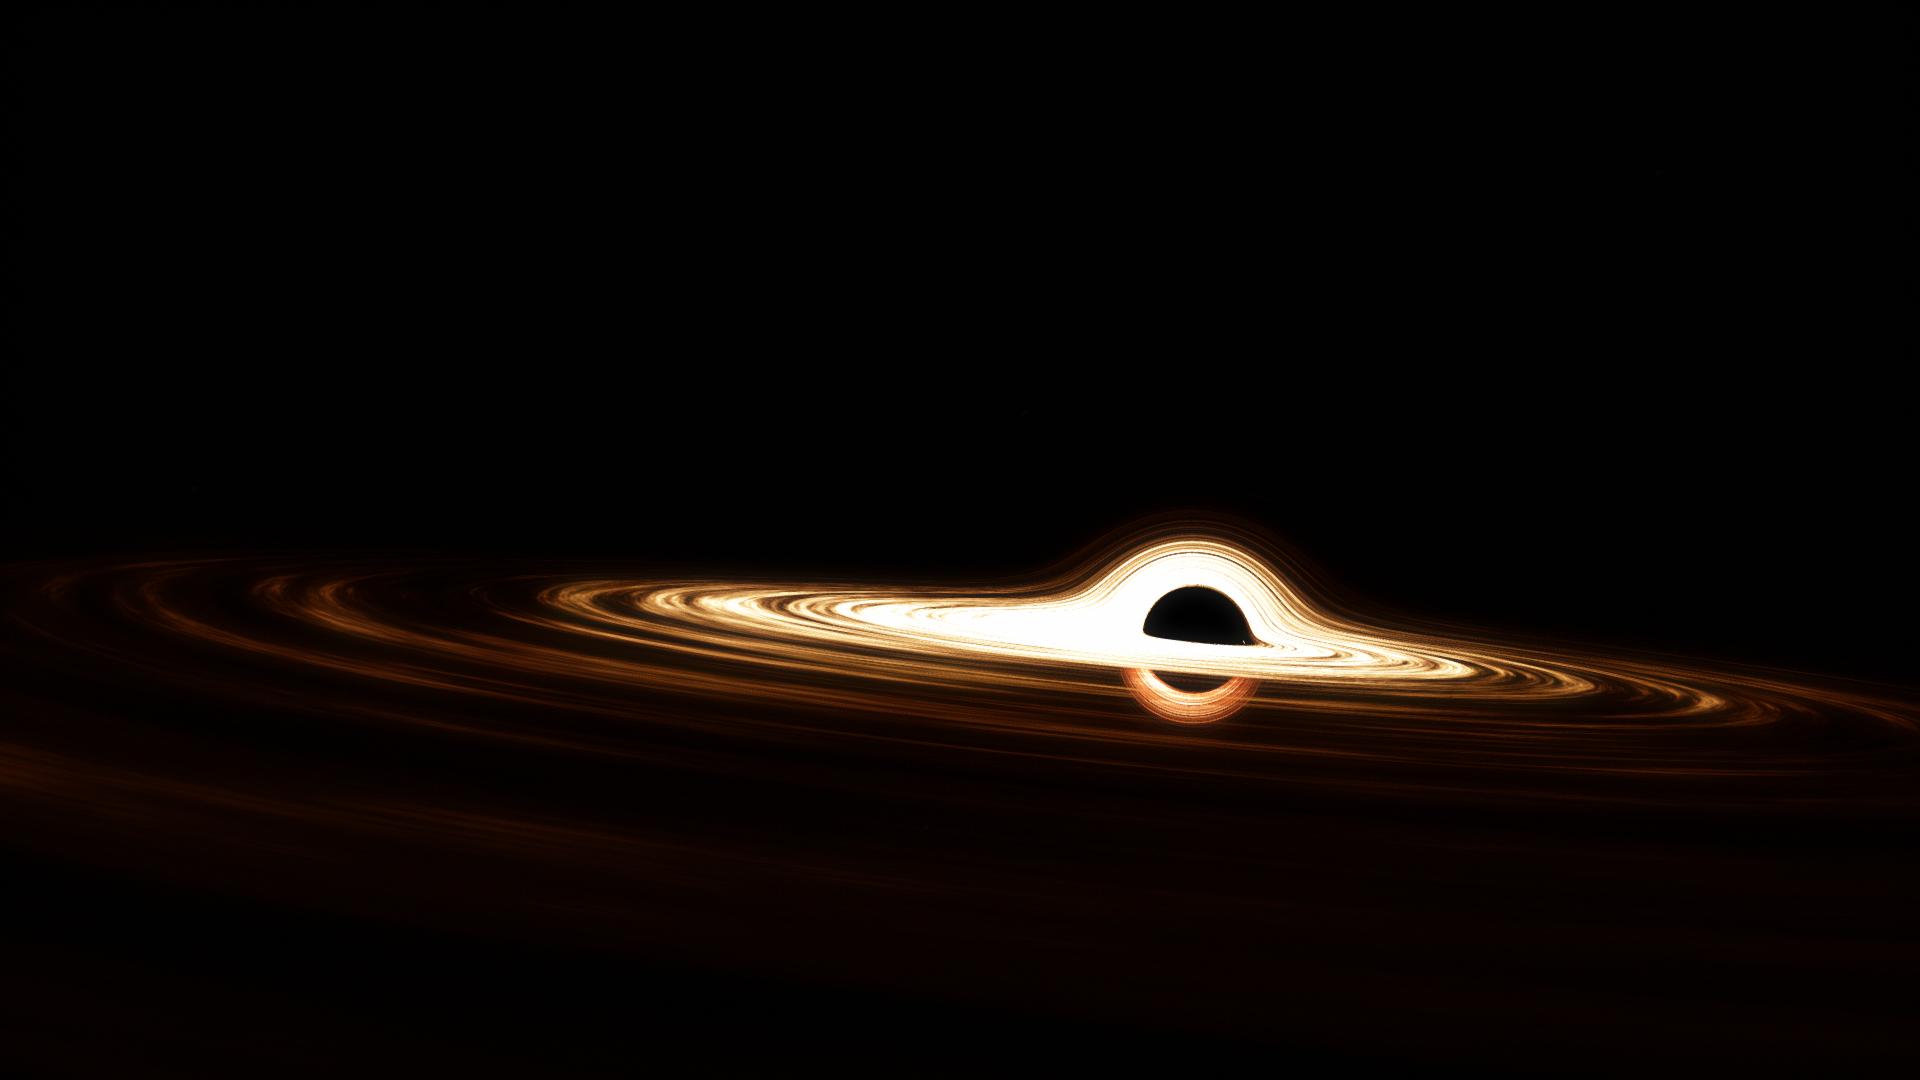 The Monster Black Hole Ton 618 Spaceengine Black Hole Astronomy Event Horizon